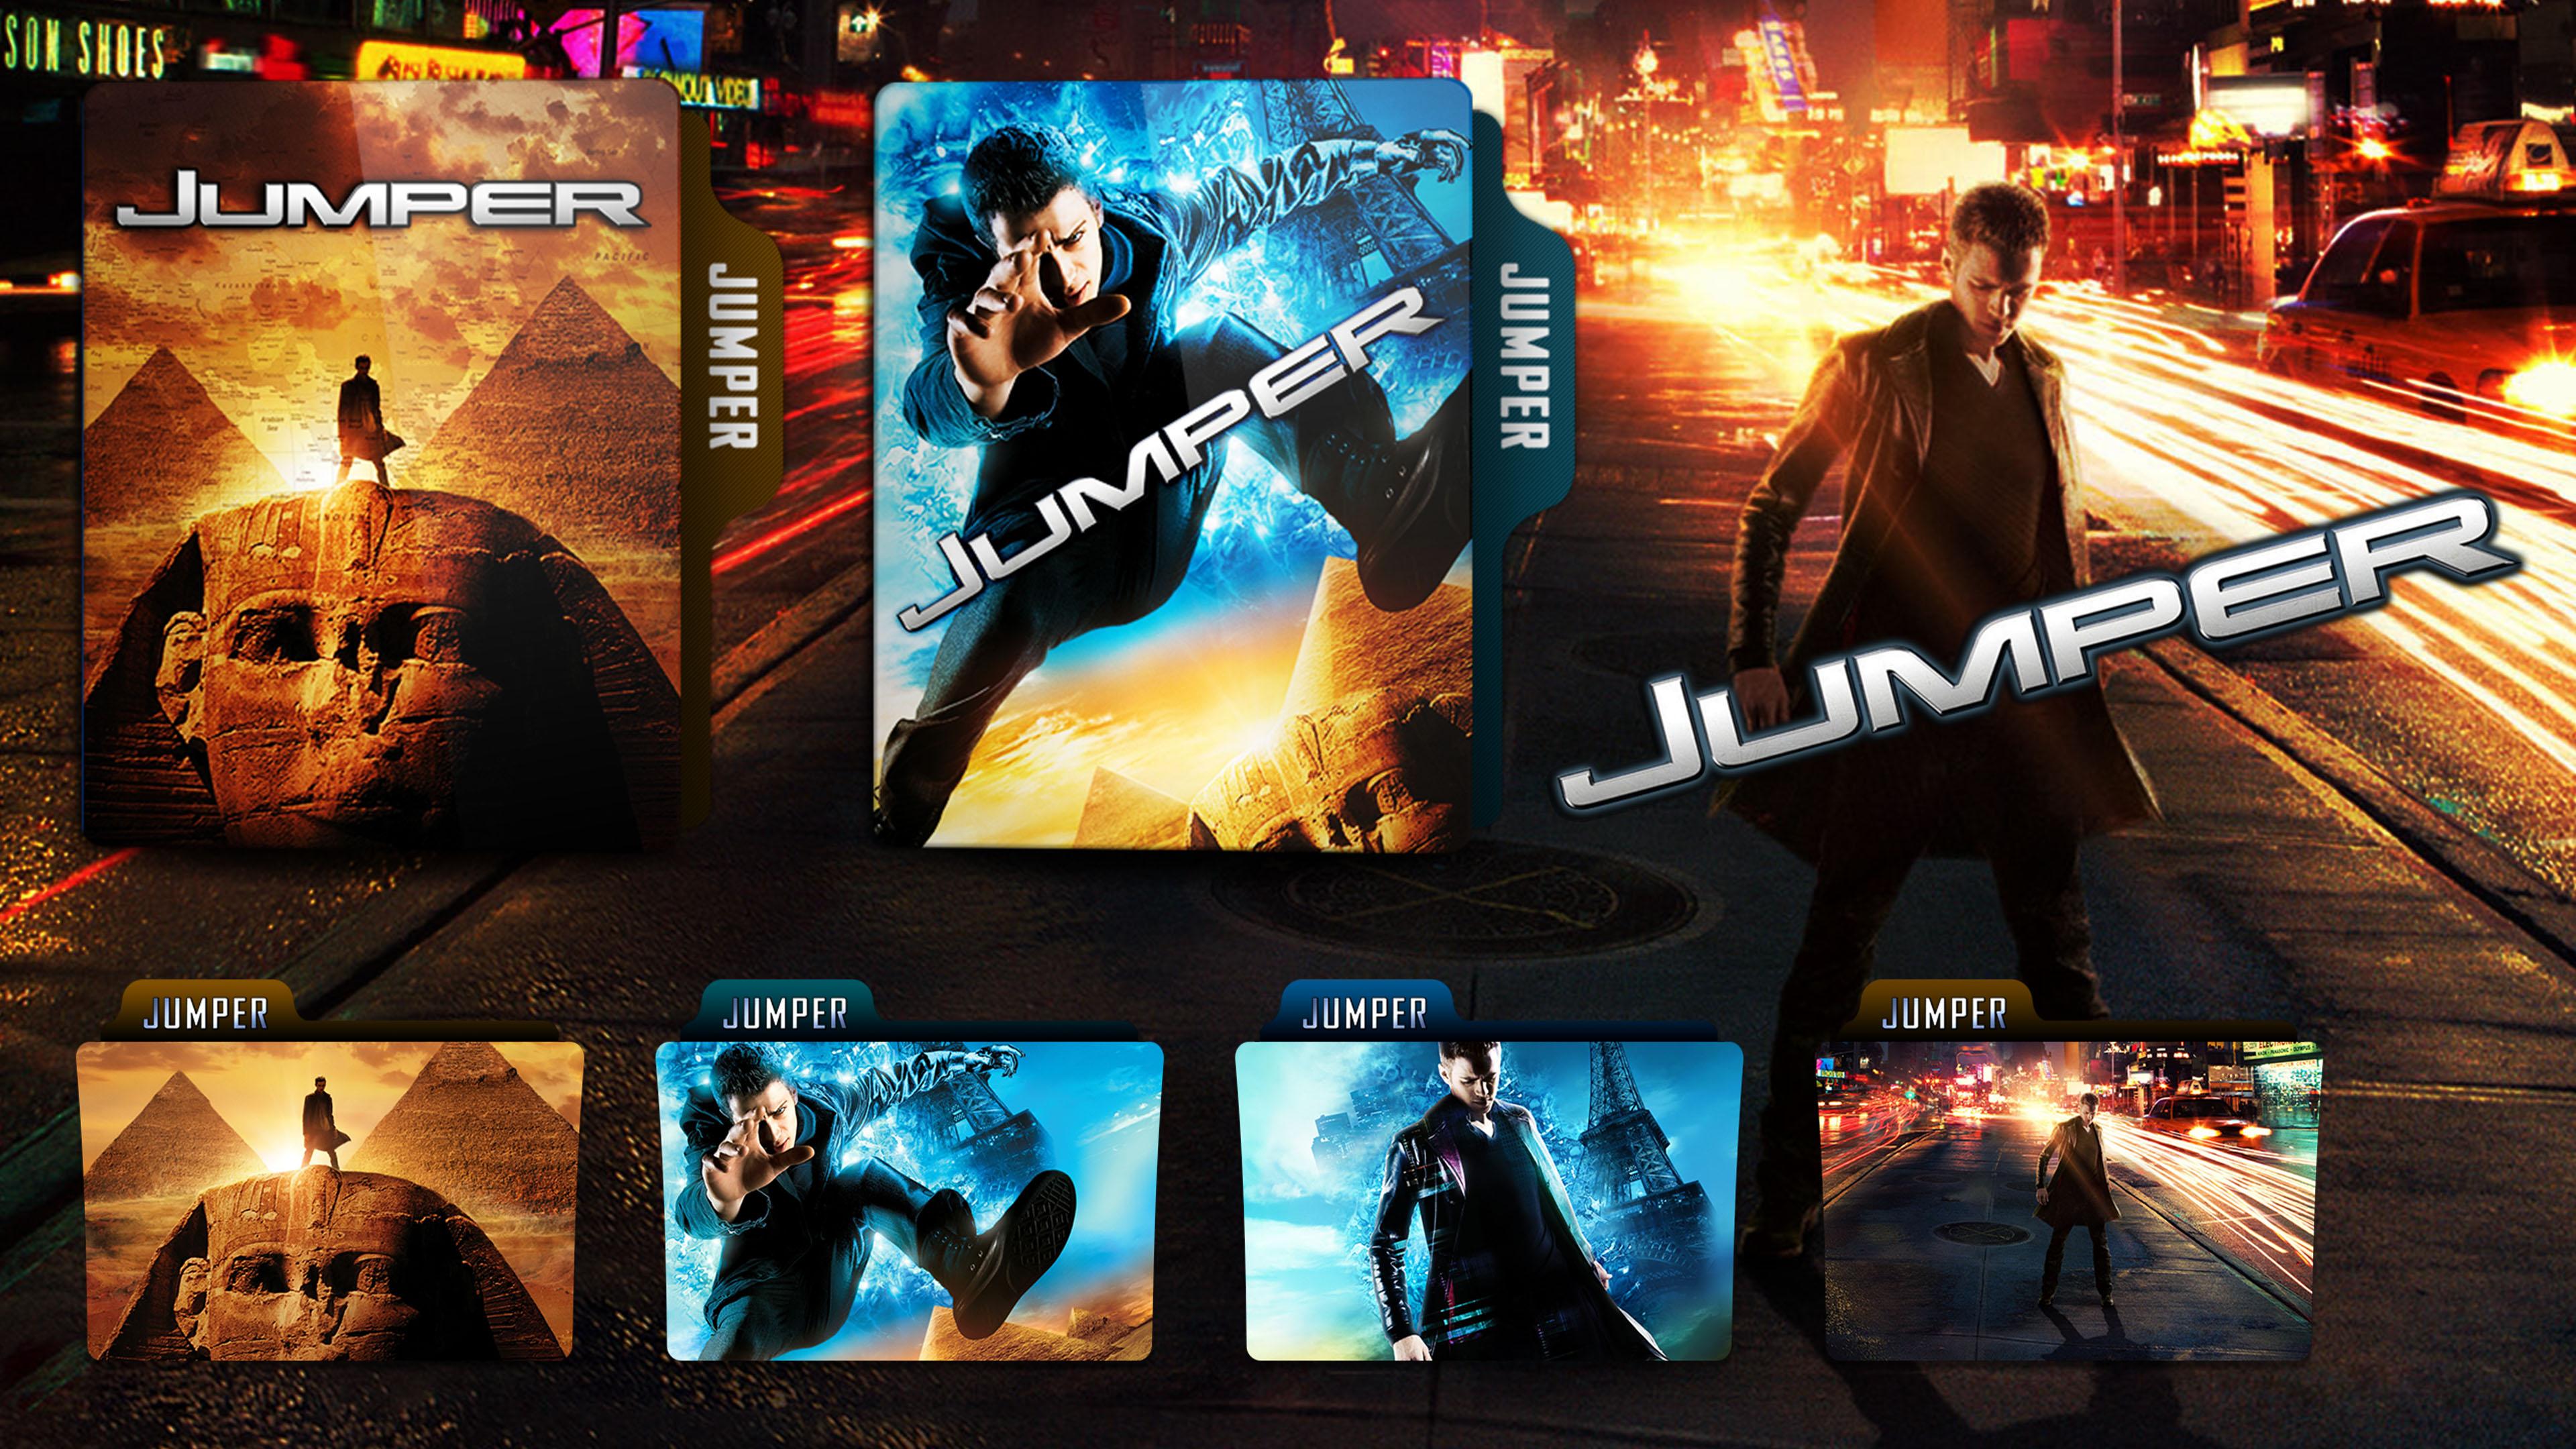 Jumper 2008 Folder Icon By Hns Rock On Deviantart